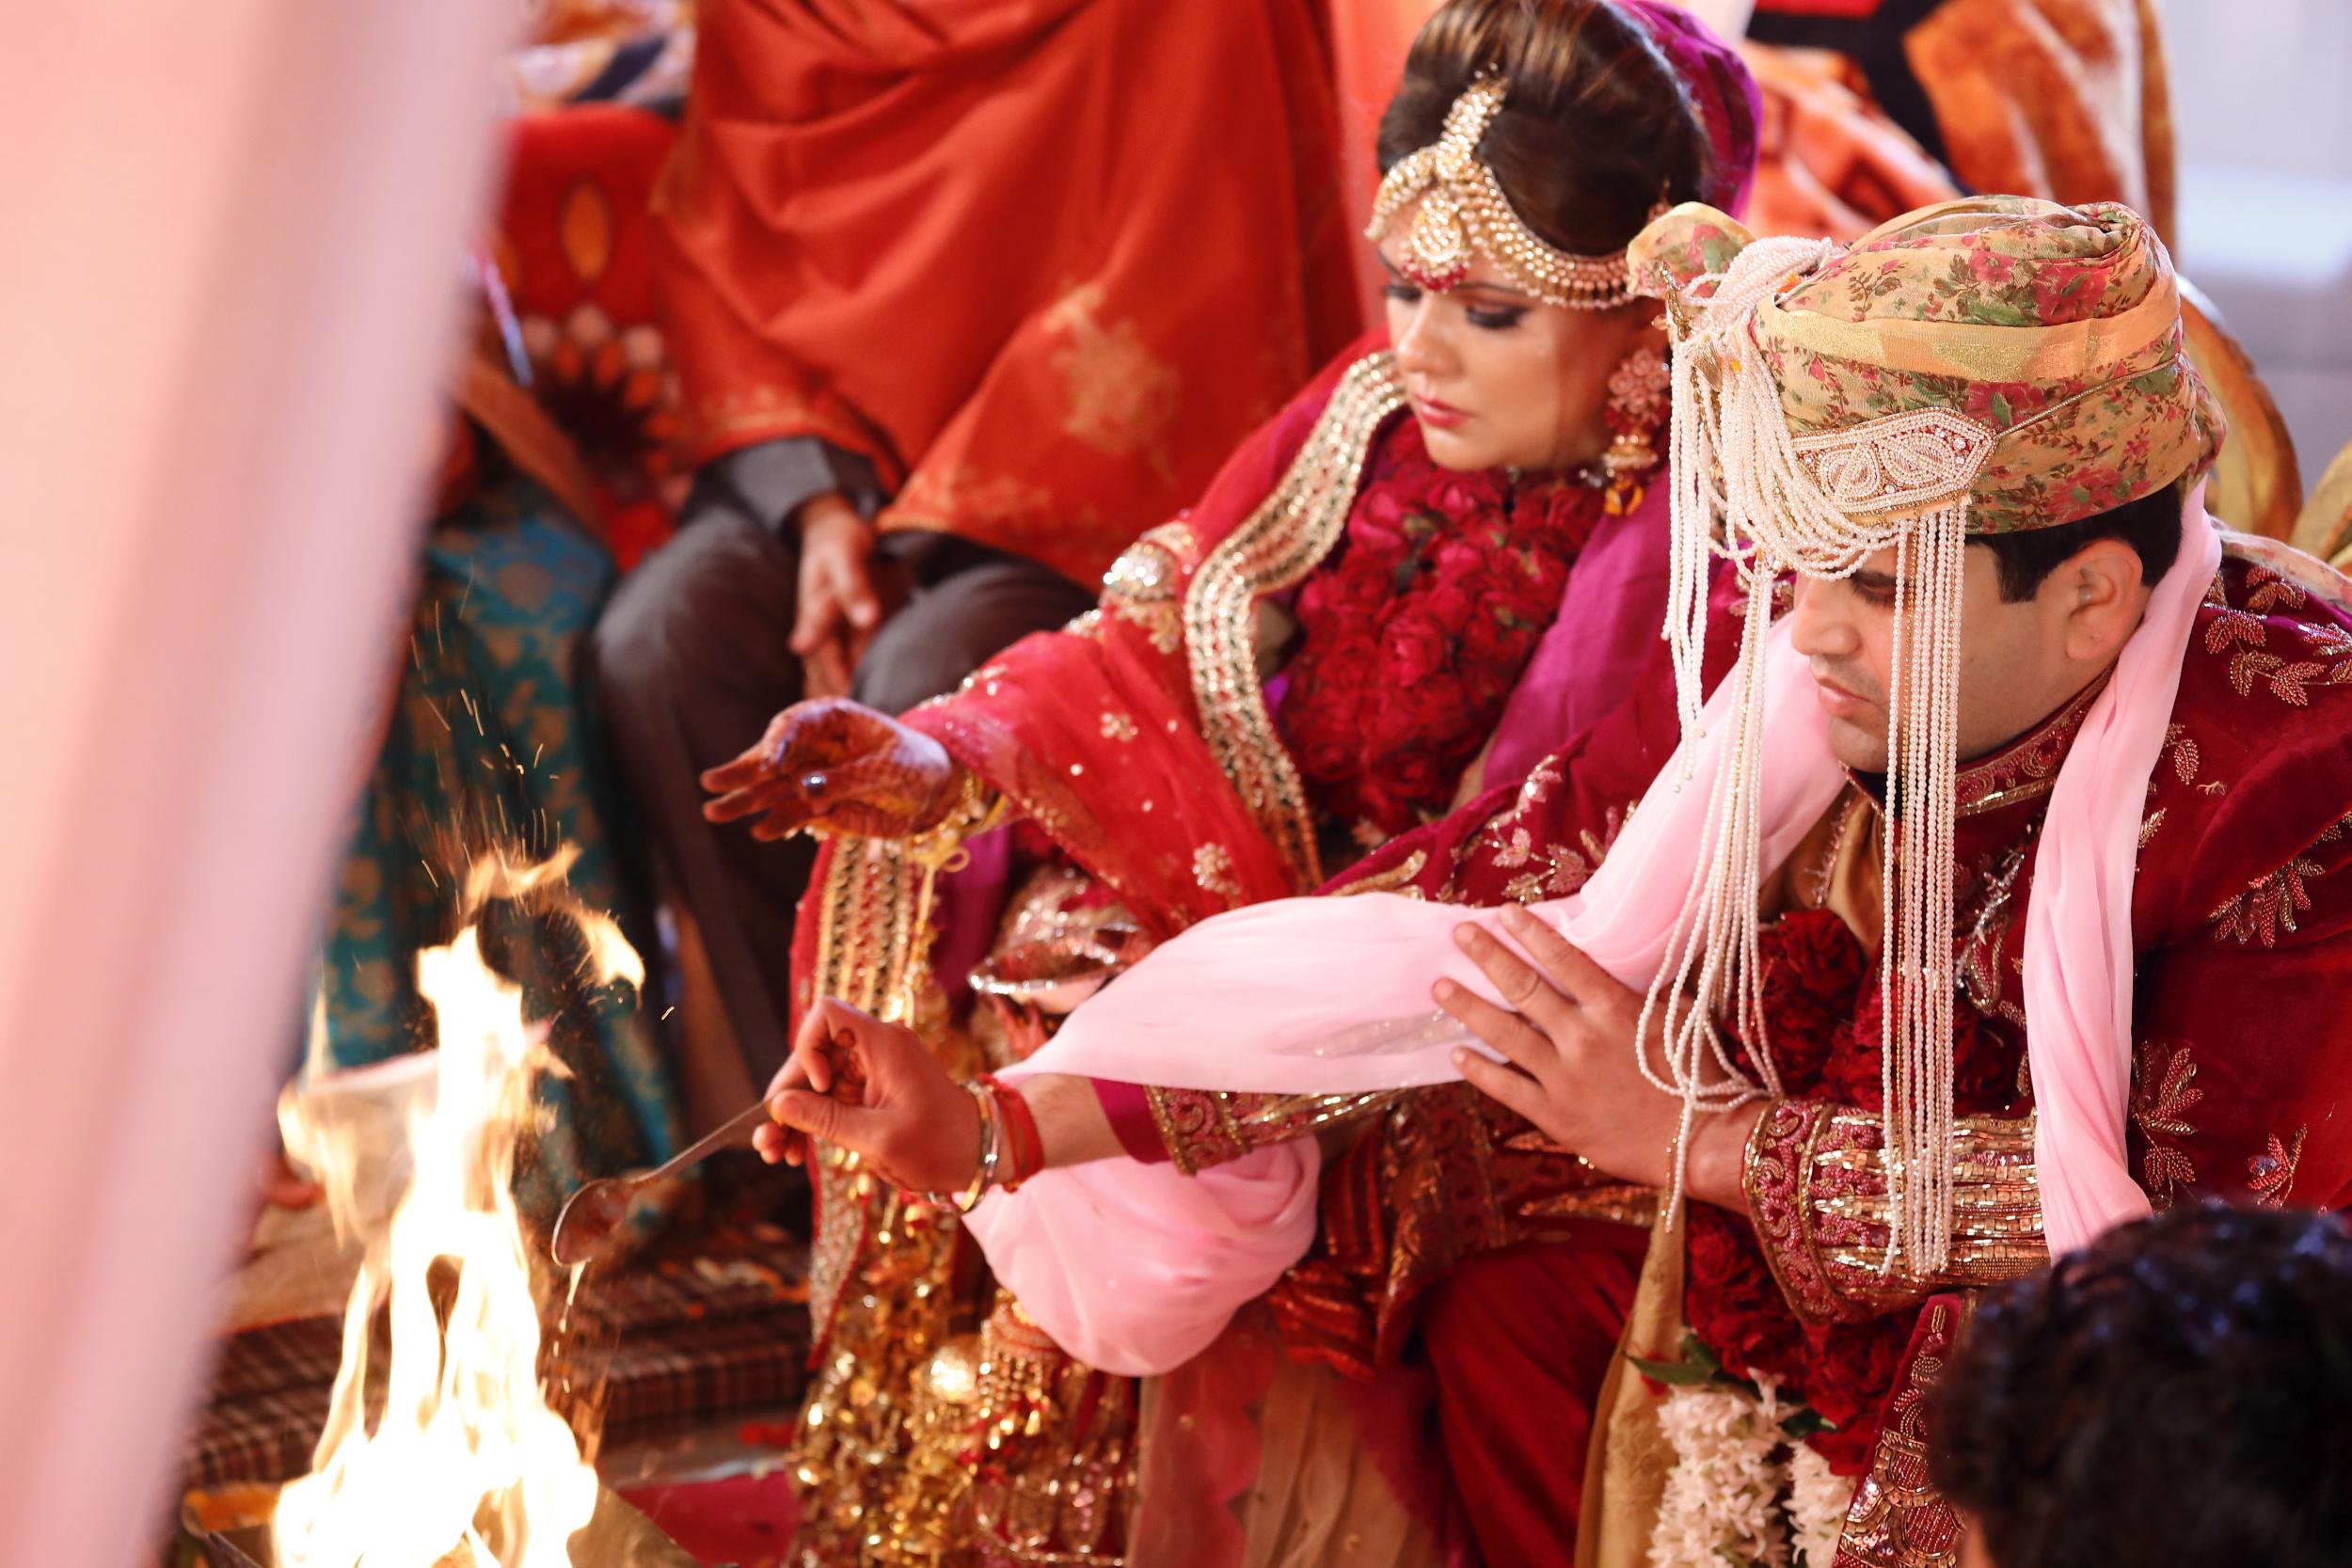 Candid wedding photographersC69A1243 Delhi